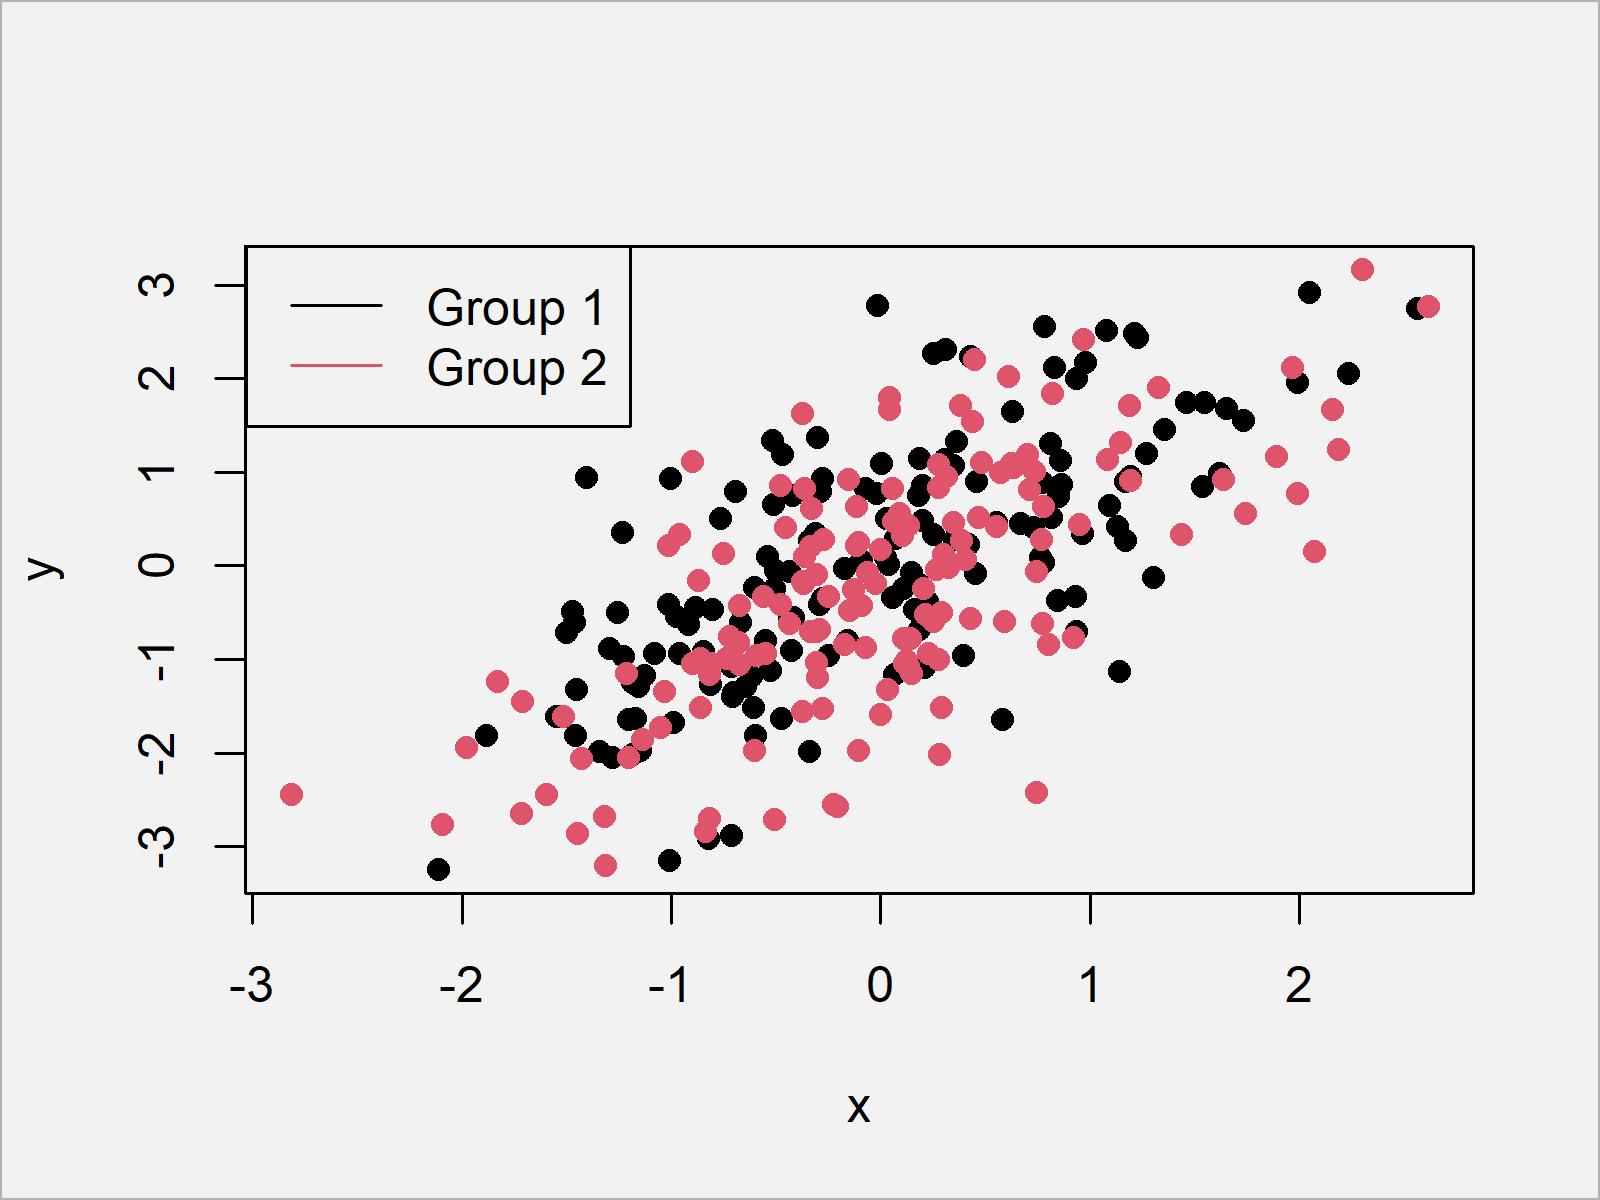 r graph figure 8 add legend base